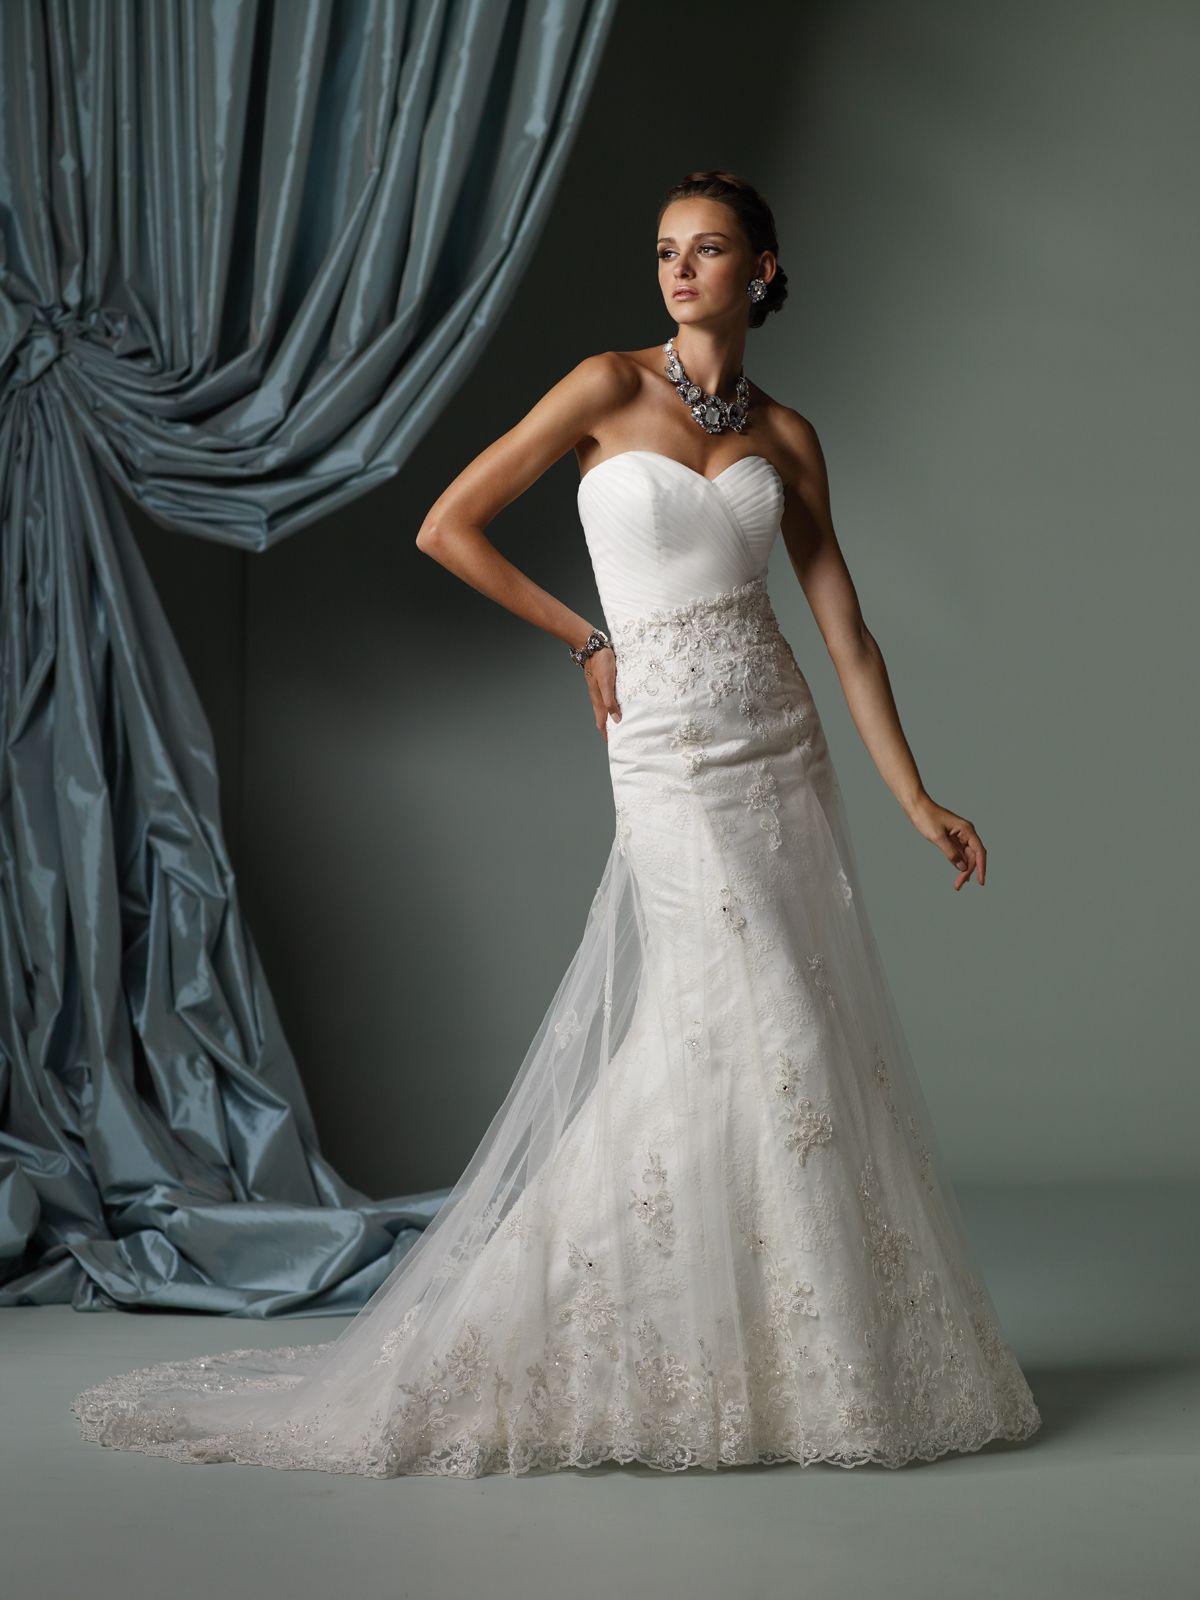 Very pretty james clifford wedding ideas for katie pinterest